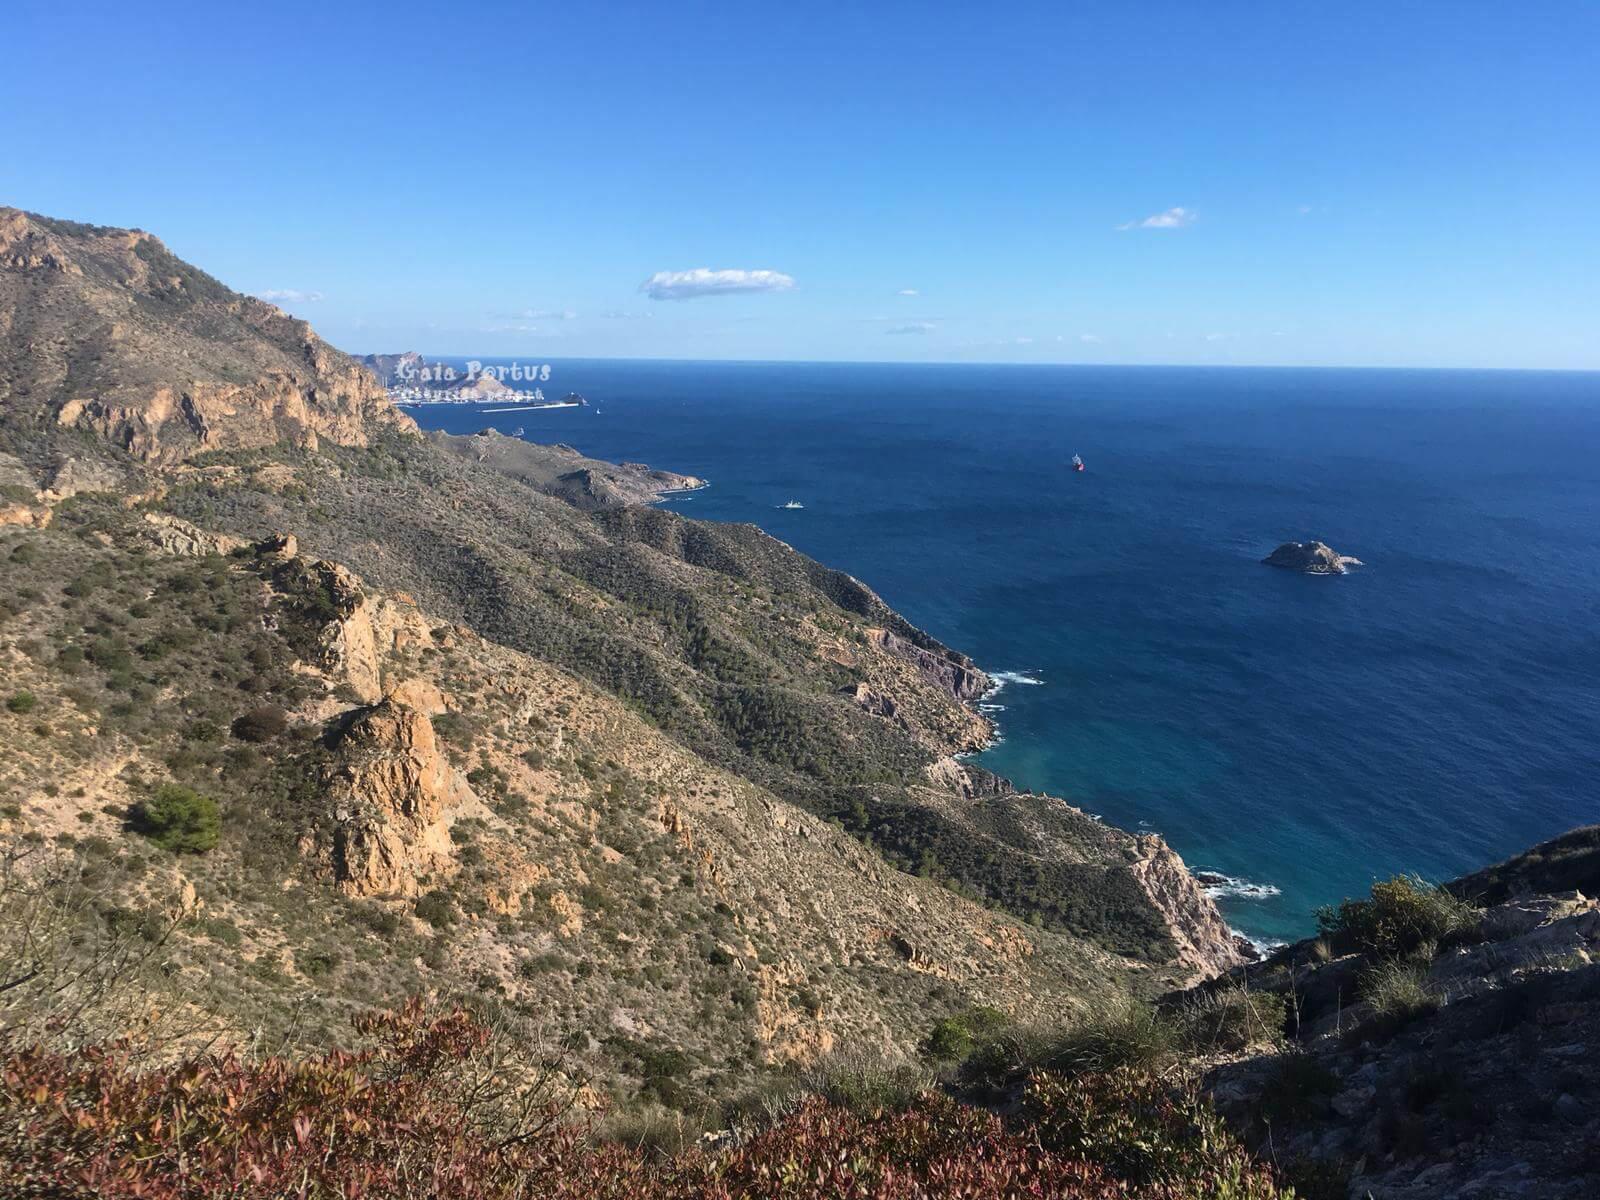 Private Naturist Cabin El Portús Beach Houses For Rent In Cartagena Región De Murcia Spain